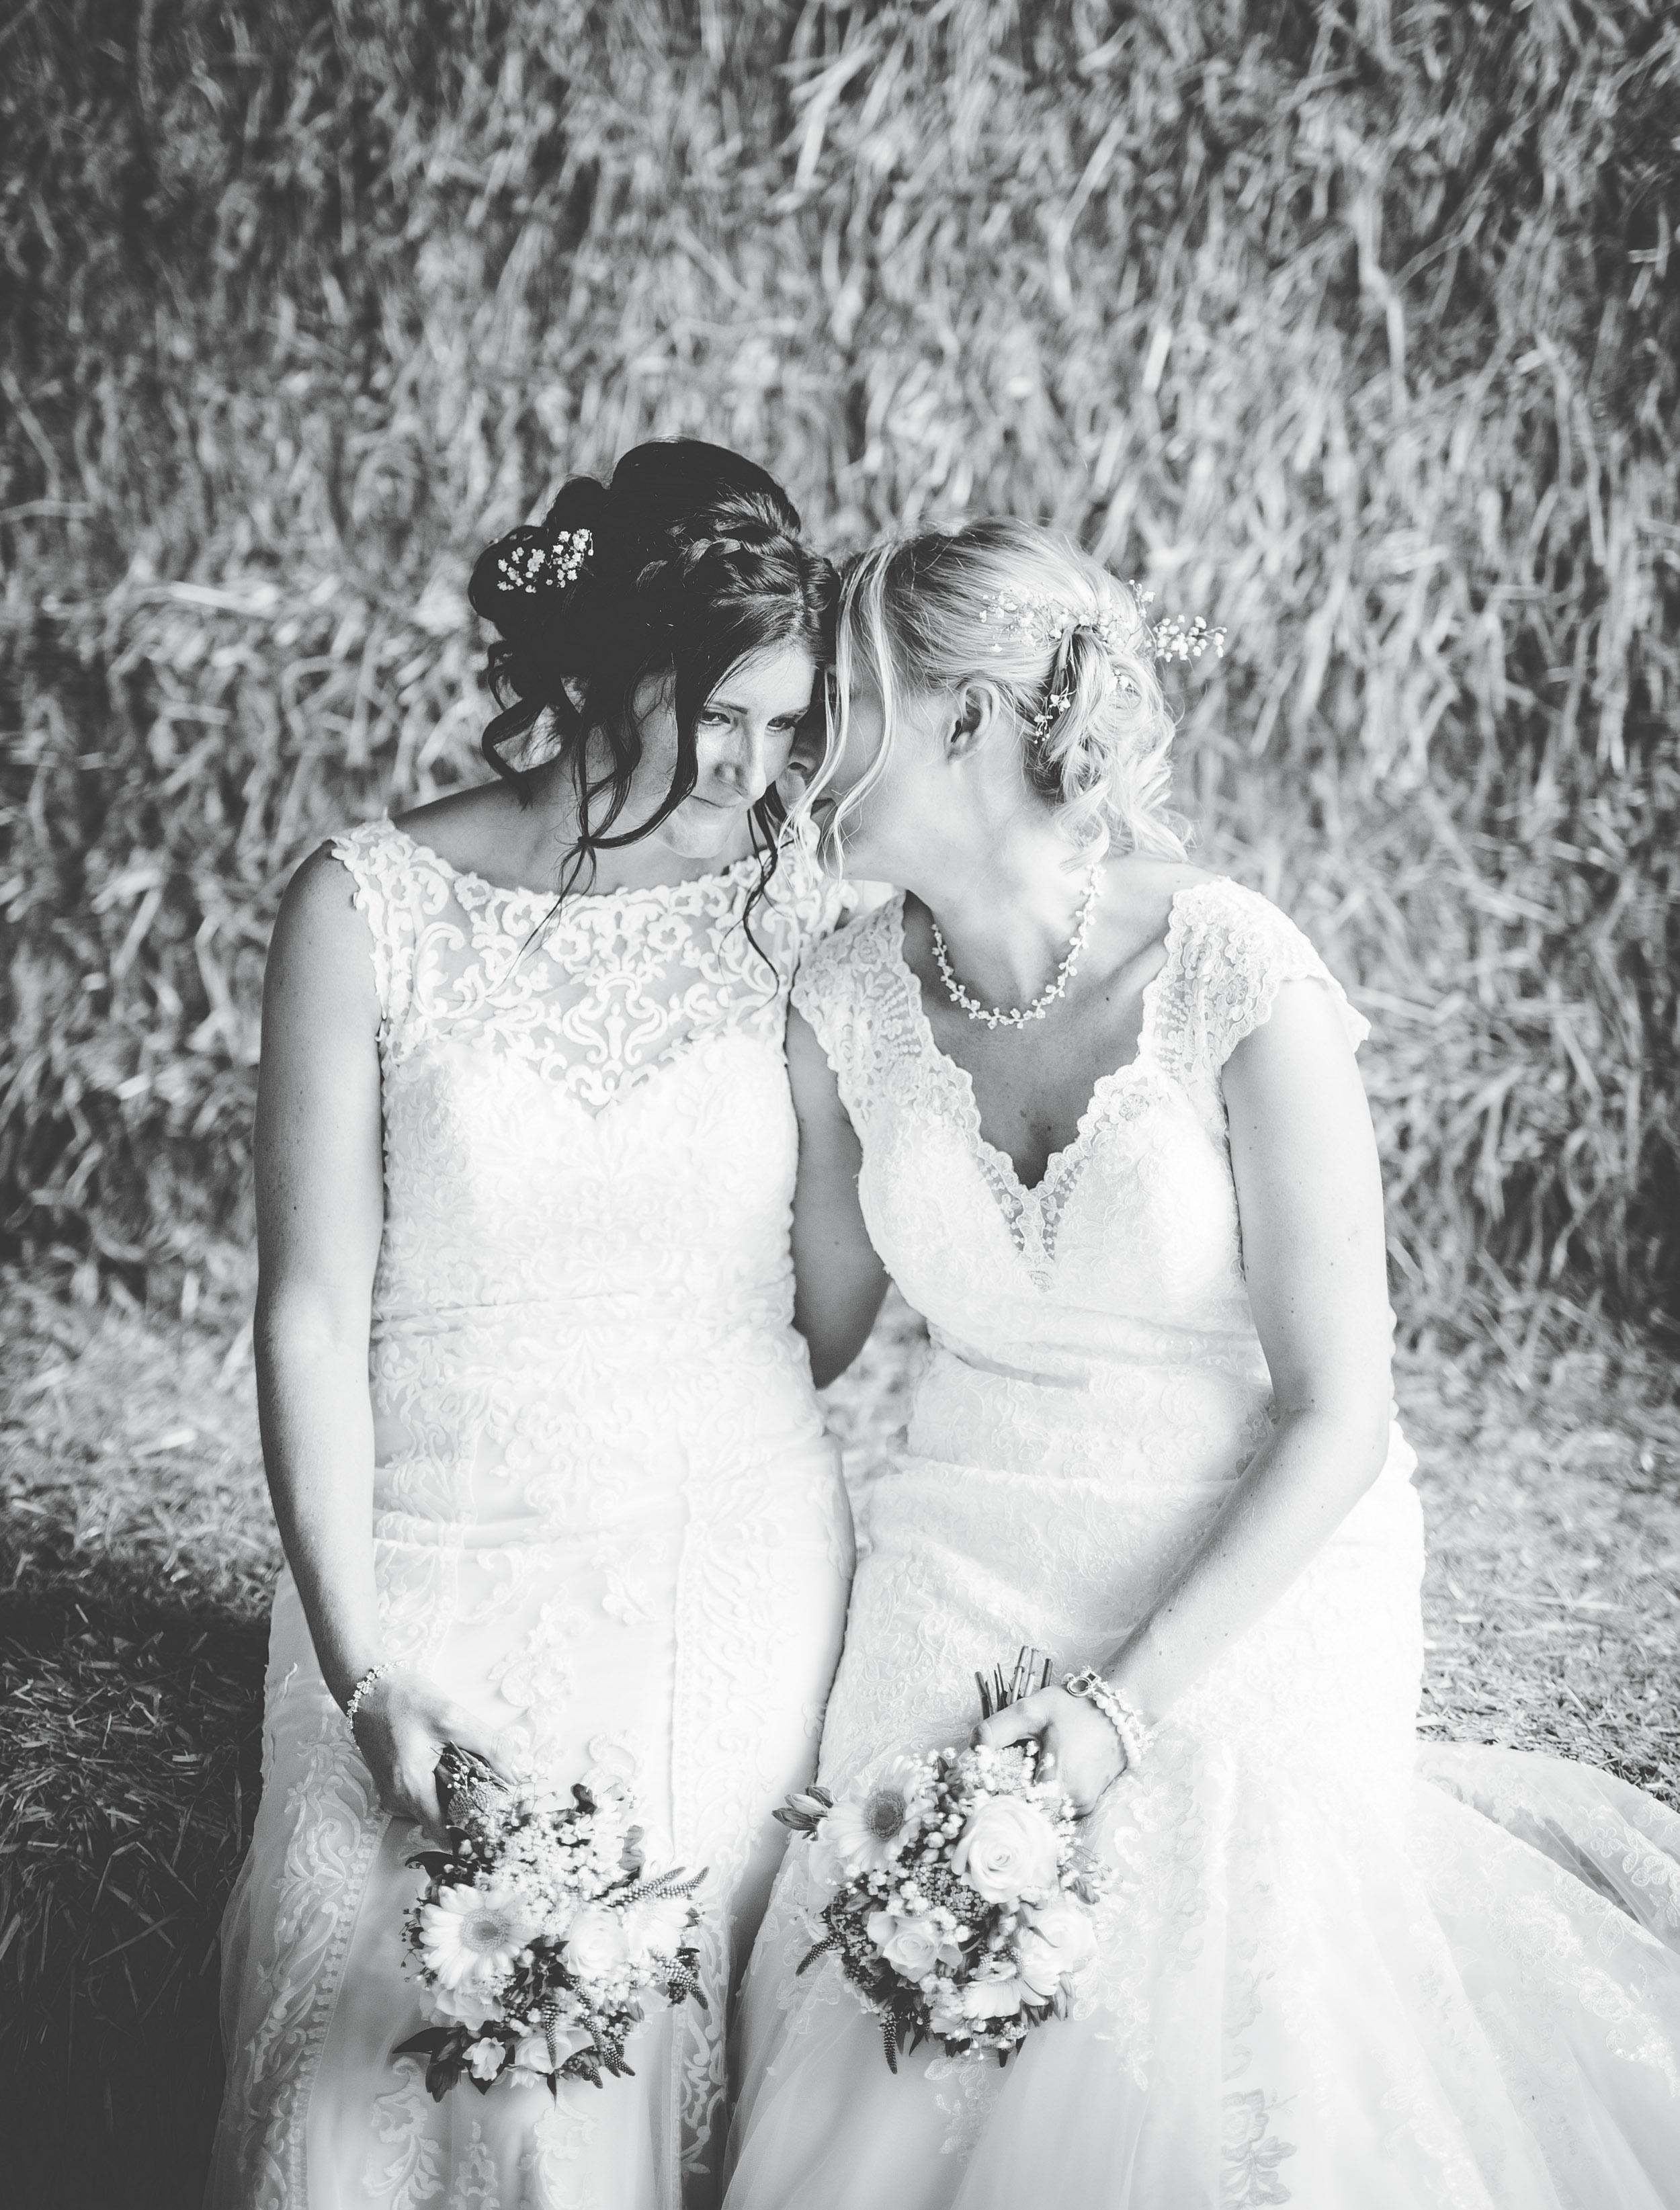 Owen House wedding barn - bride and bride Same sex wedding